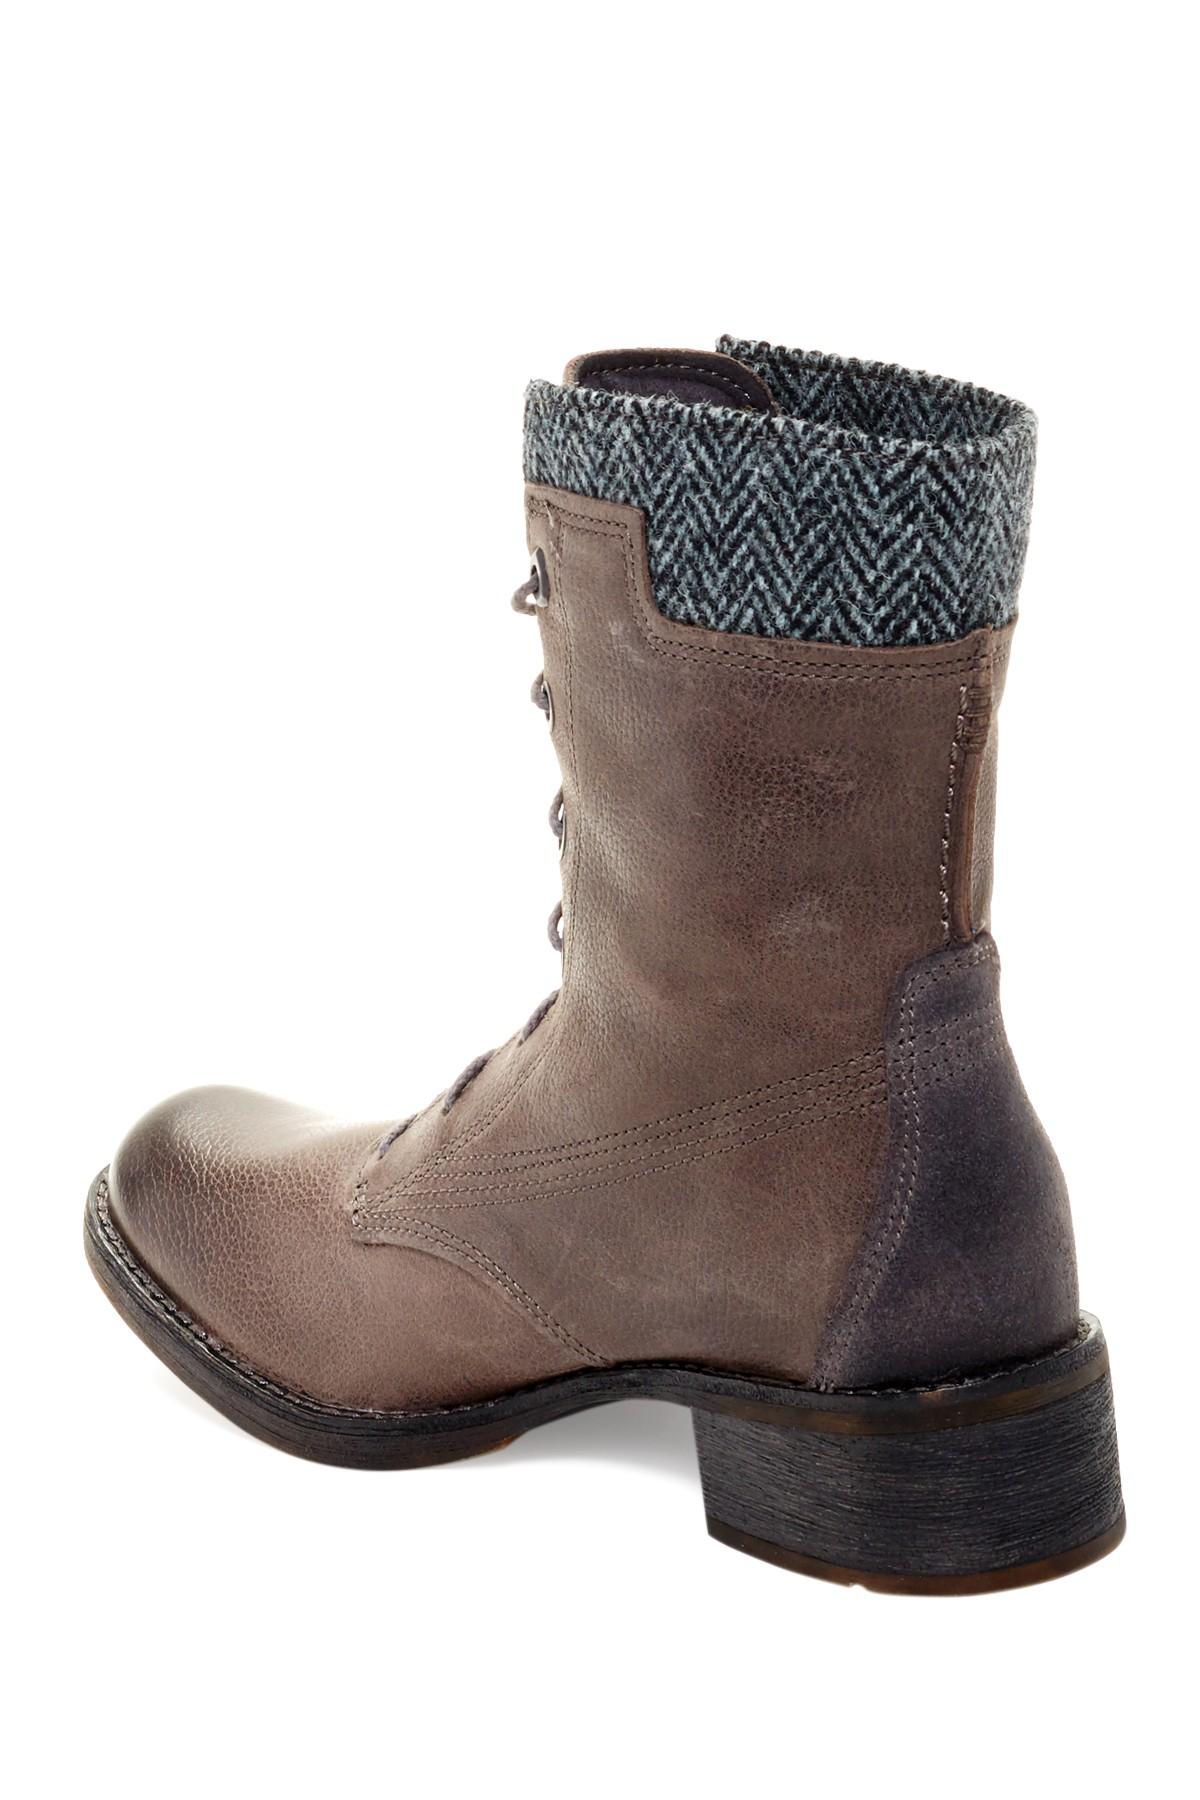 Drew Shoes Women S Mid Boot